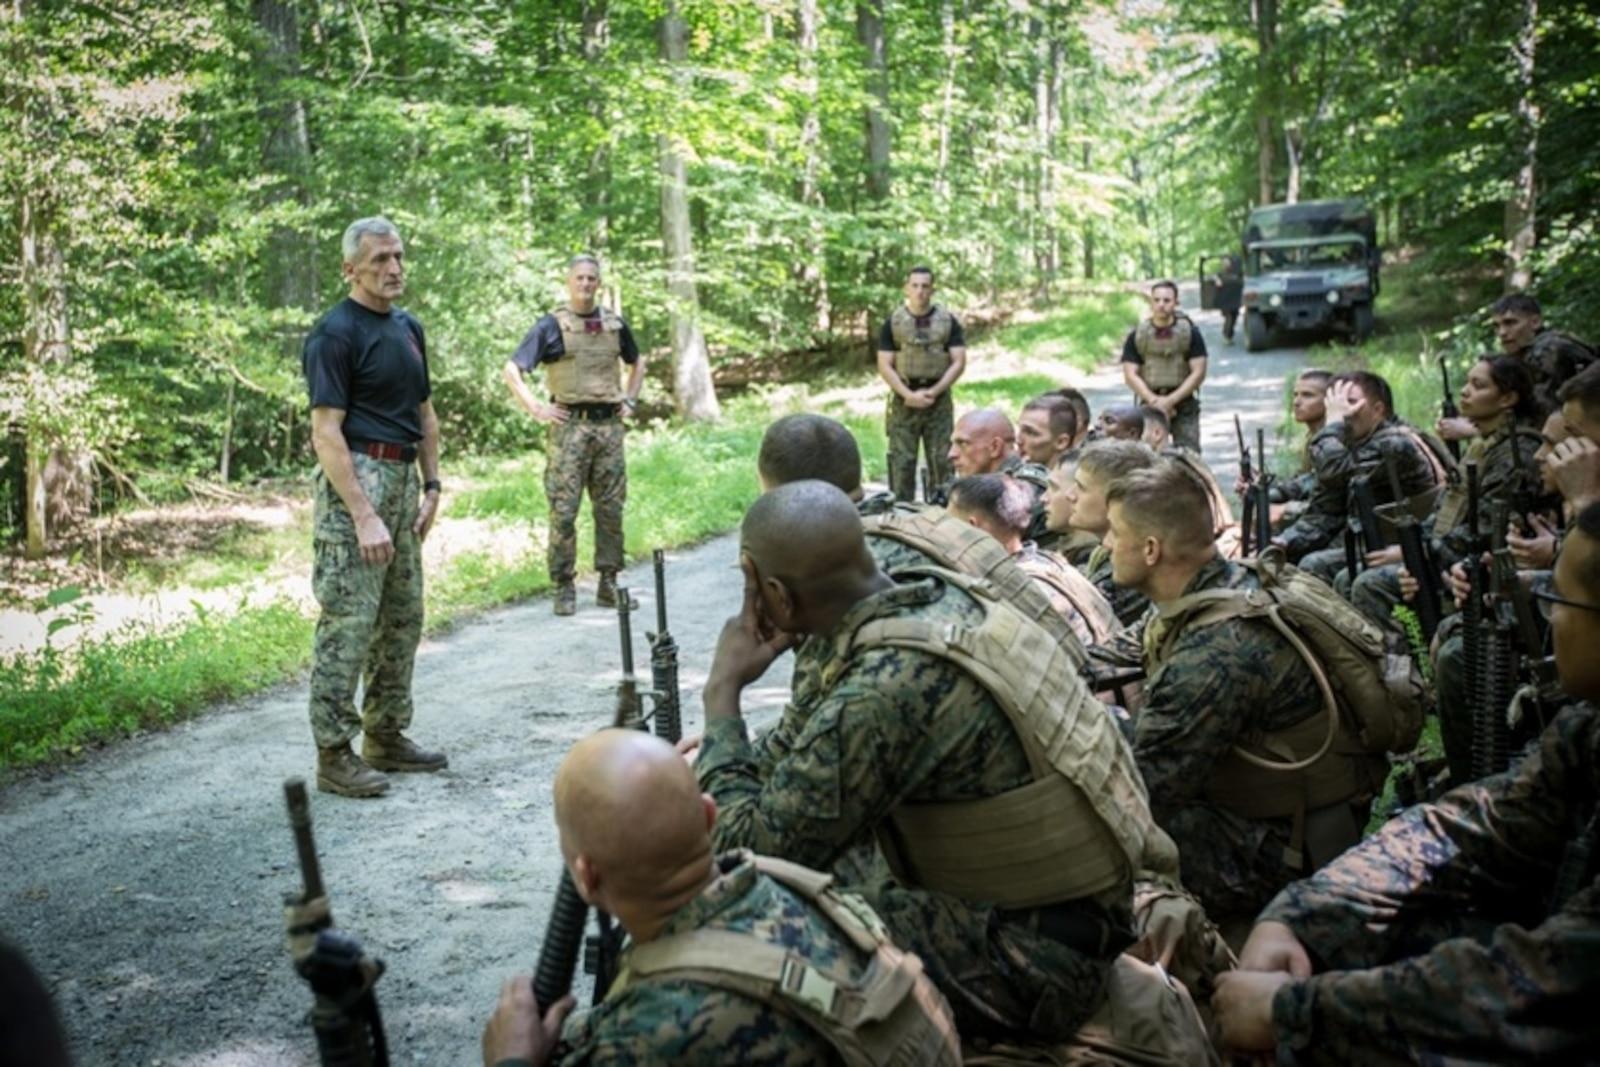 U.S. Marine Corps Lt. Col. (ret.) Joseph Shusko (left) speaks to the students of the Martial Arts Instructor Trainer Course aboard Marine Corps Base Quantico, VA., June 21, 2017.